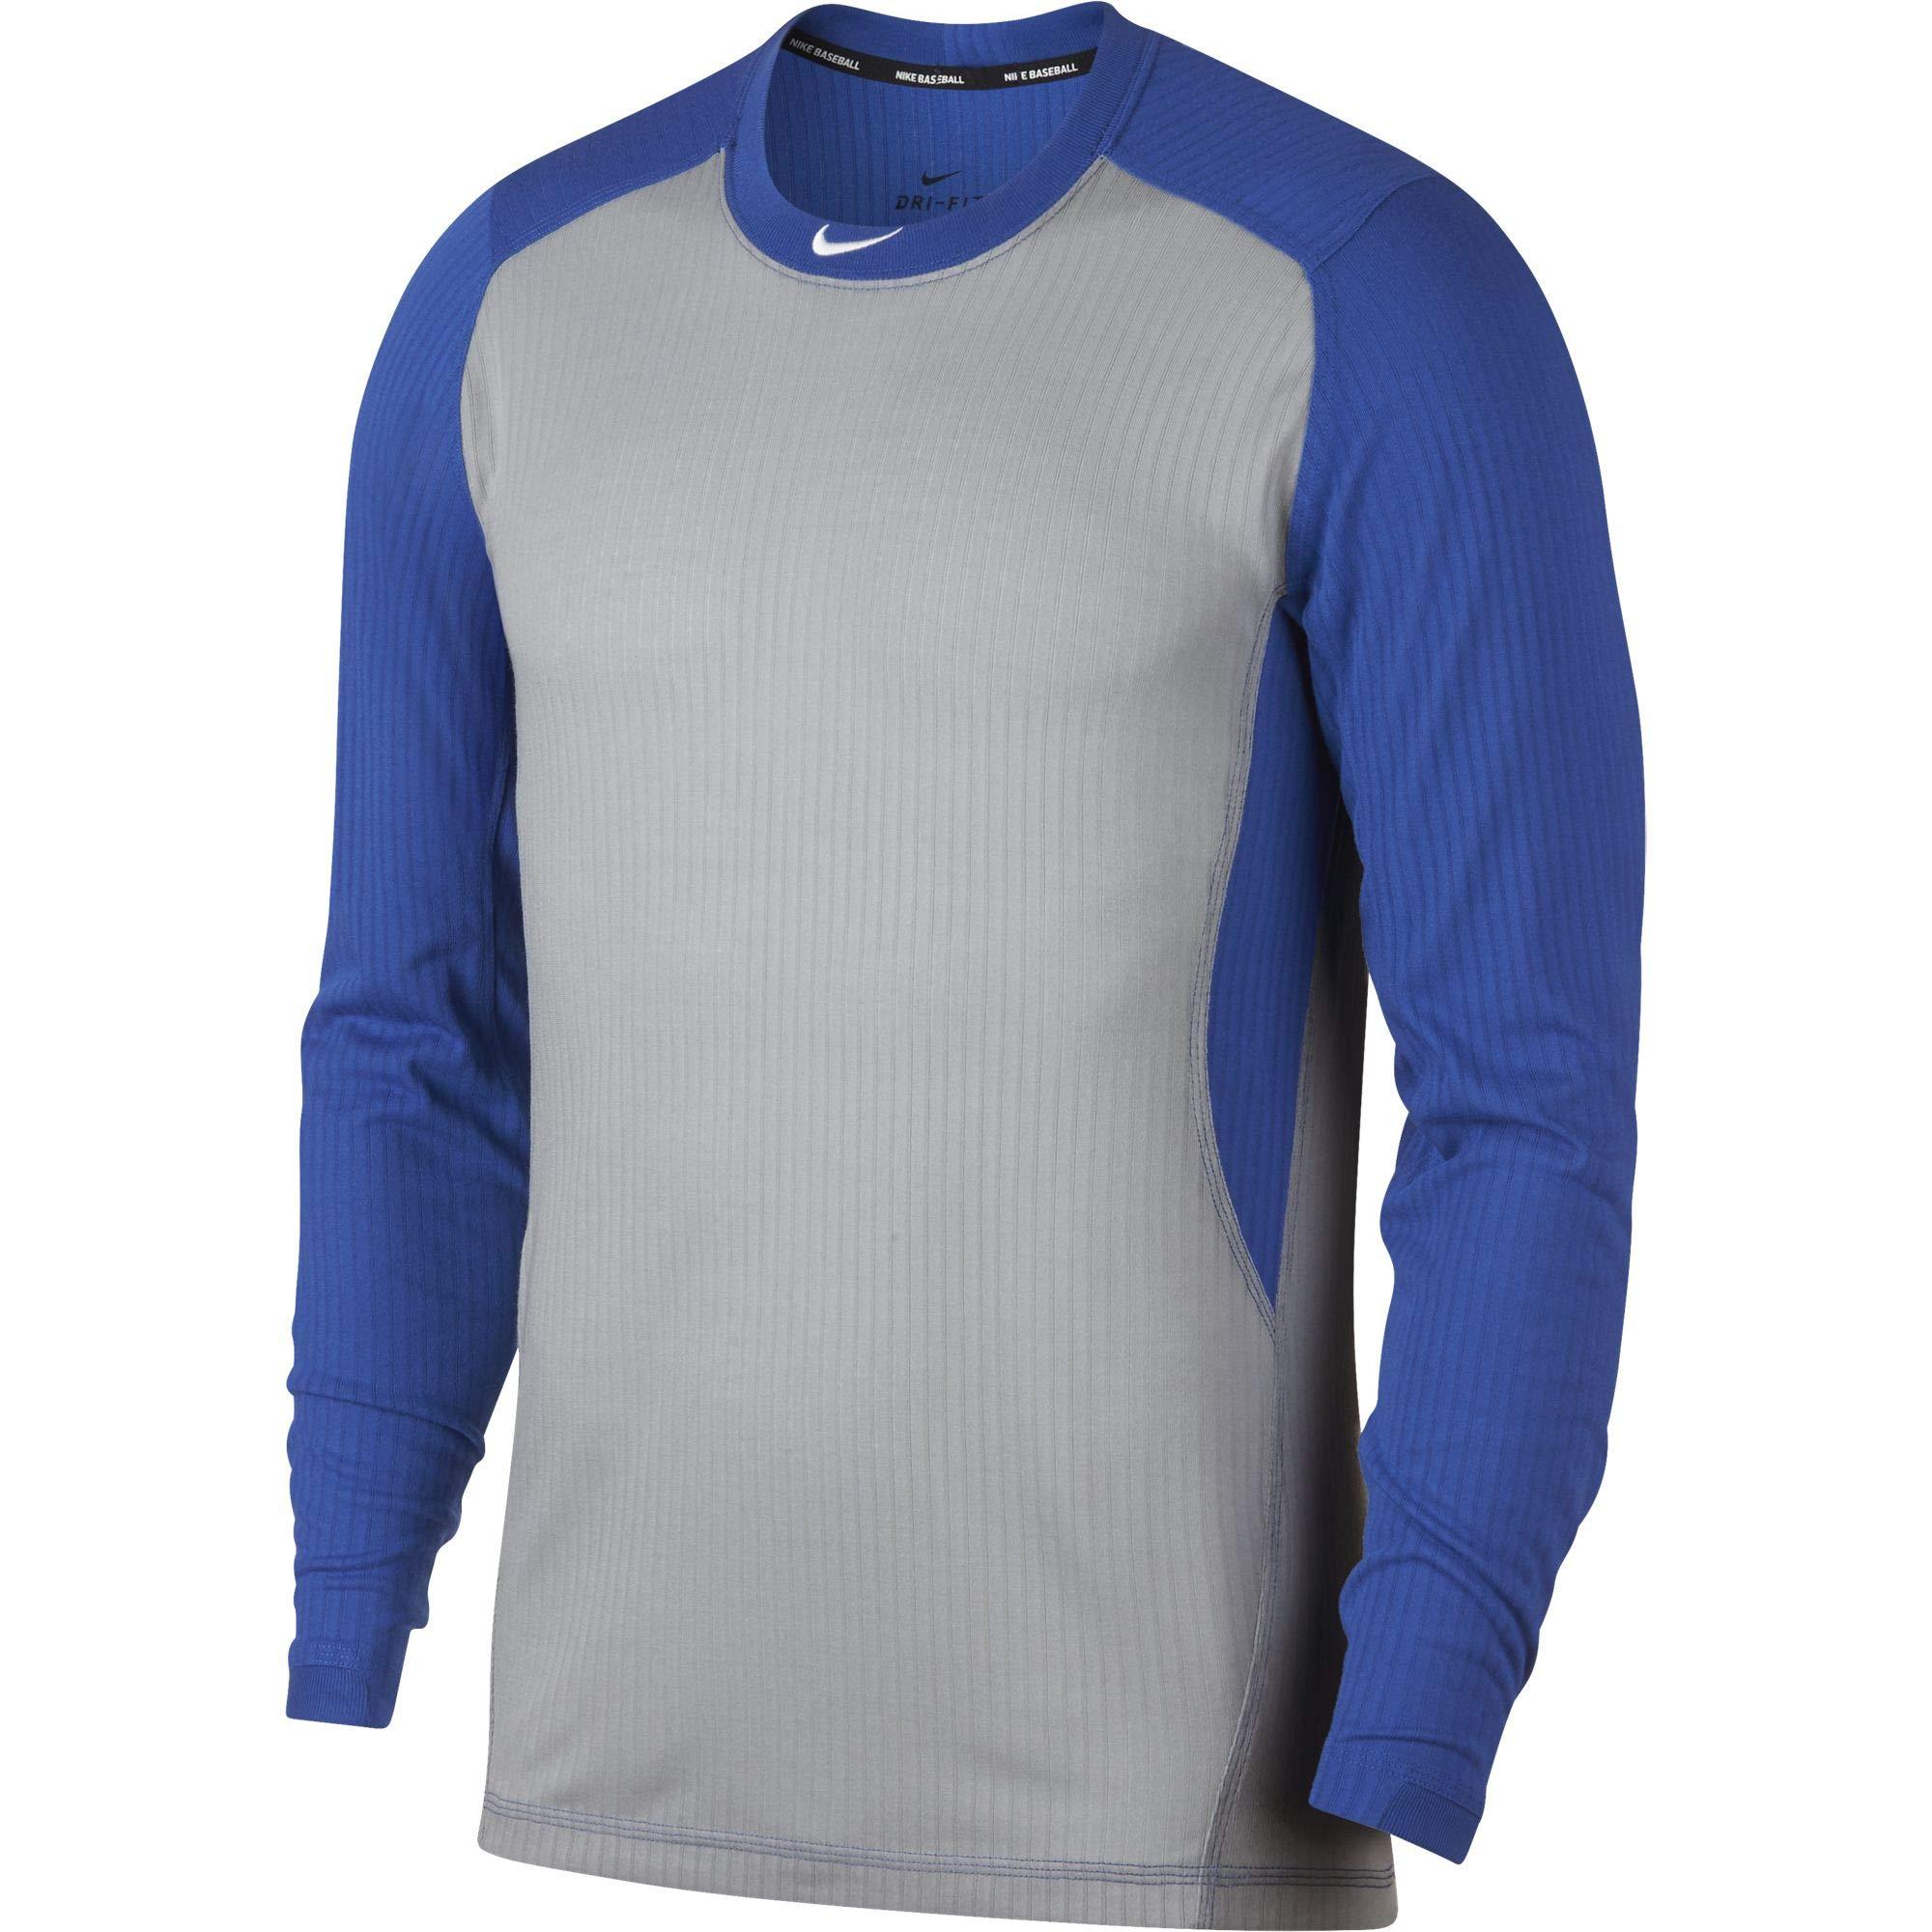 Nike Men's Long Sleeve Baseball Top Wolf Grey/Game Royal/White Size Small